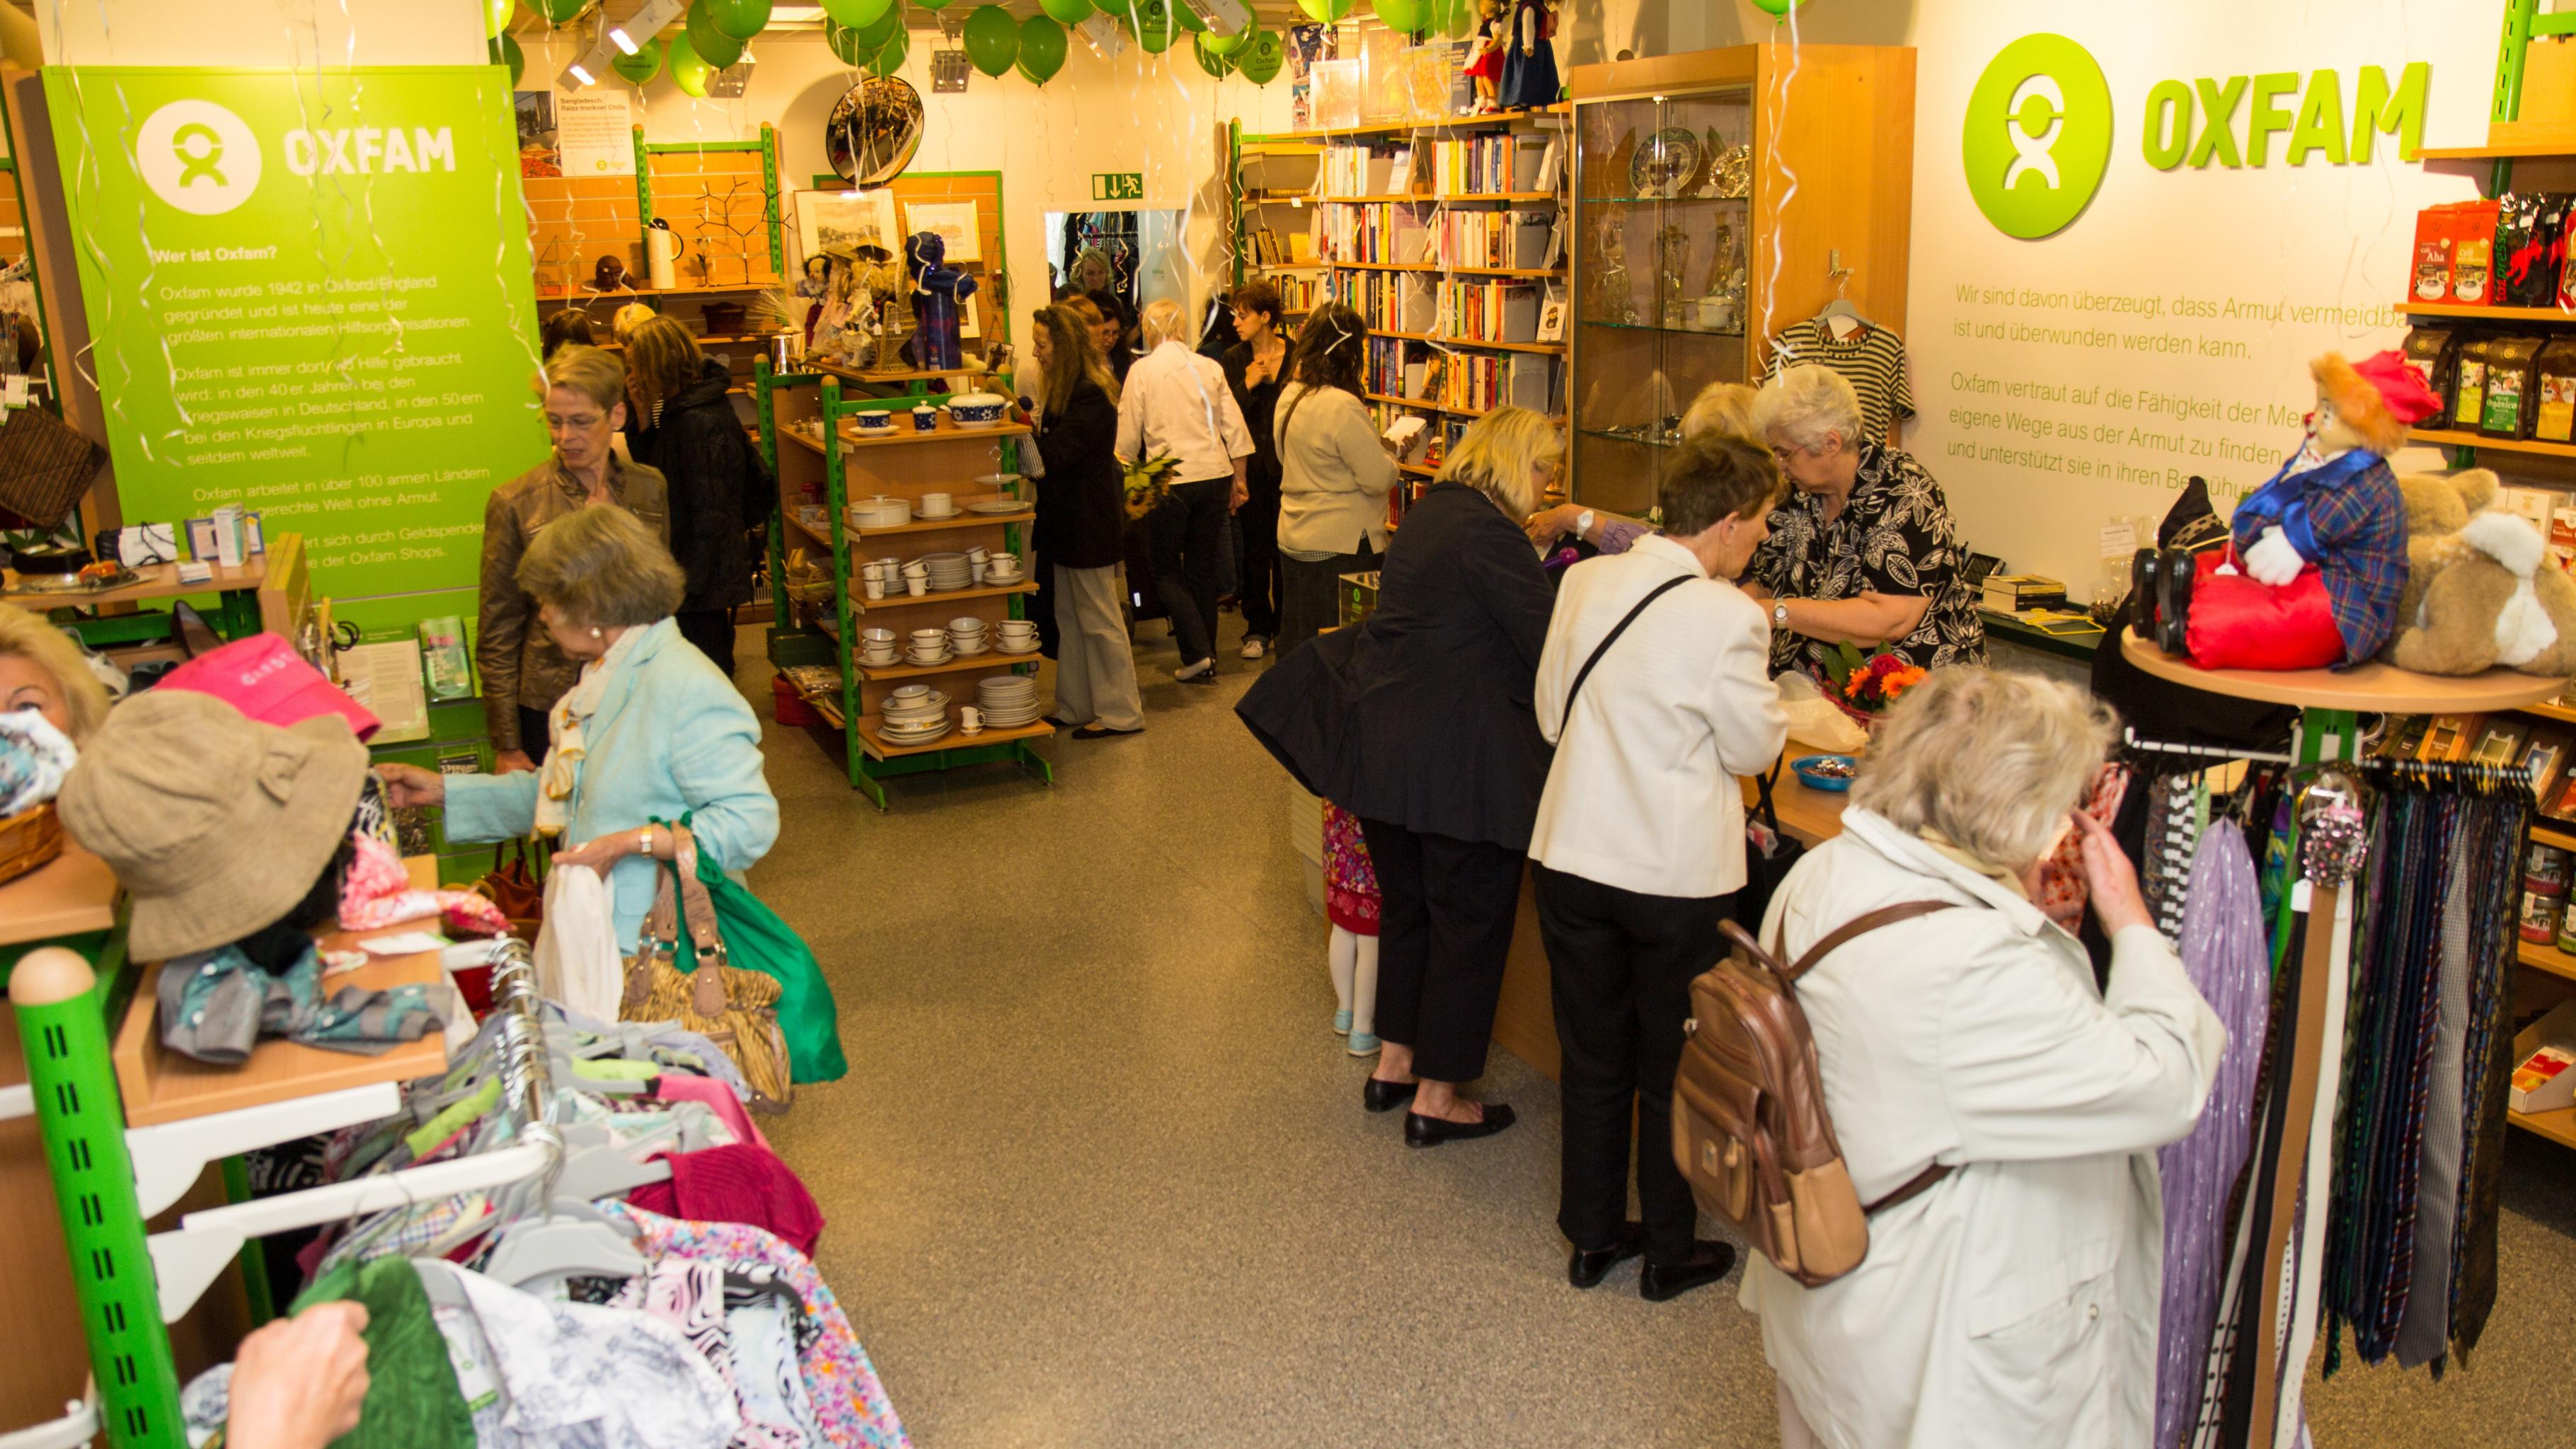 Oxfam Shop Hamburg-Wandsbek – 10. Shop-Geburtstag